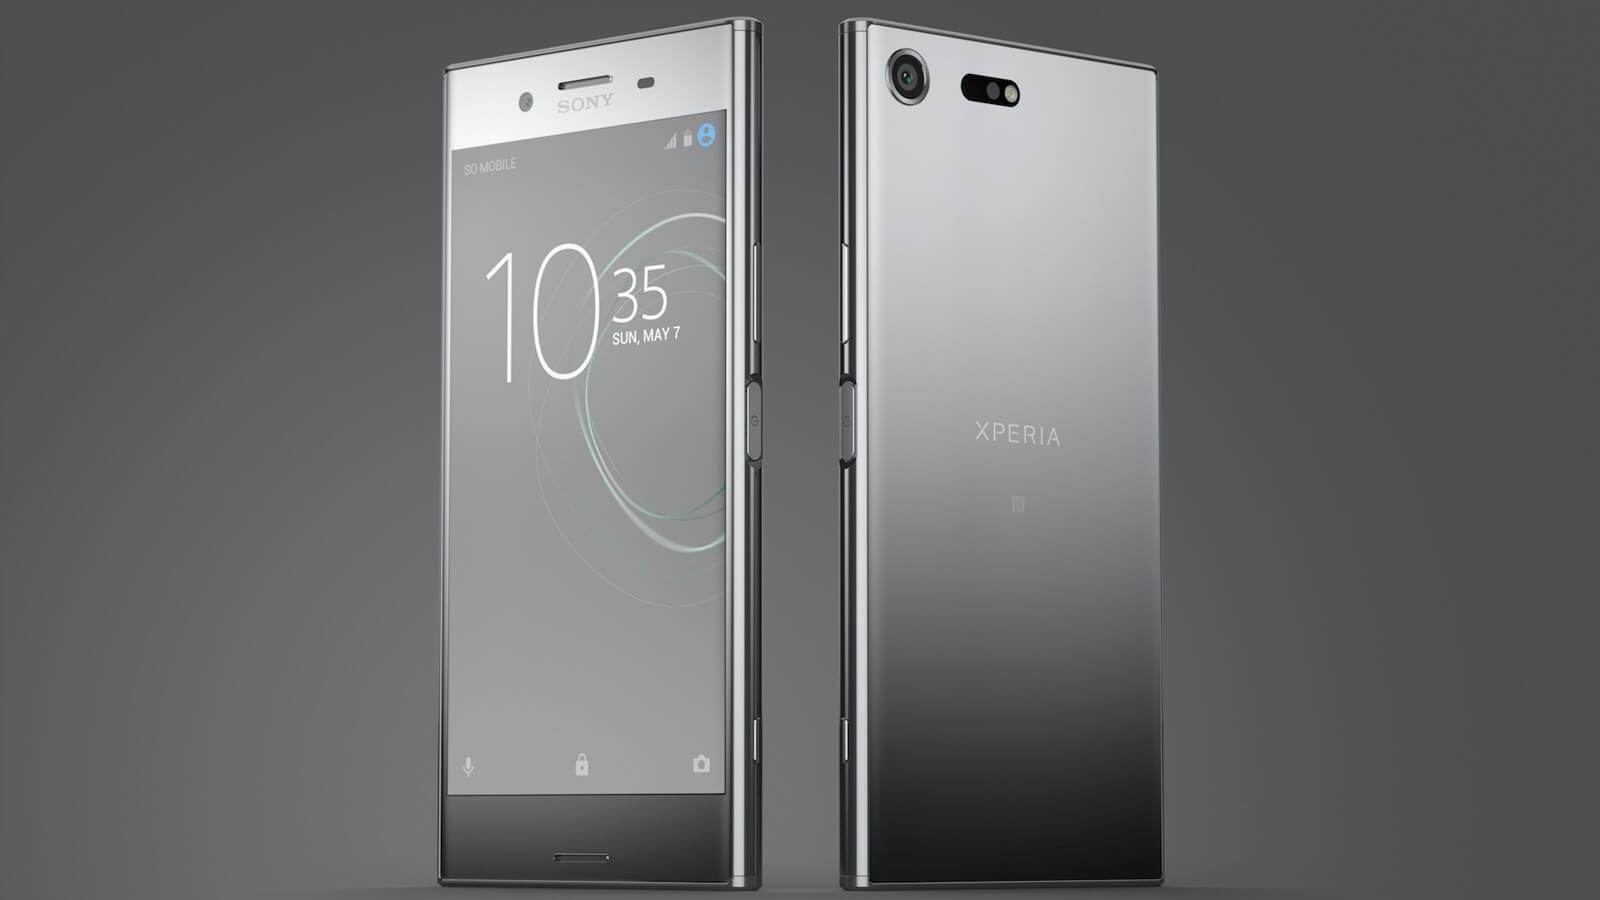 Sony xperia xz premium - smartphones top de linha